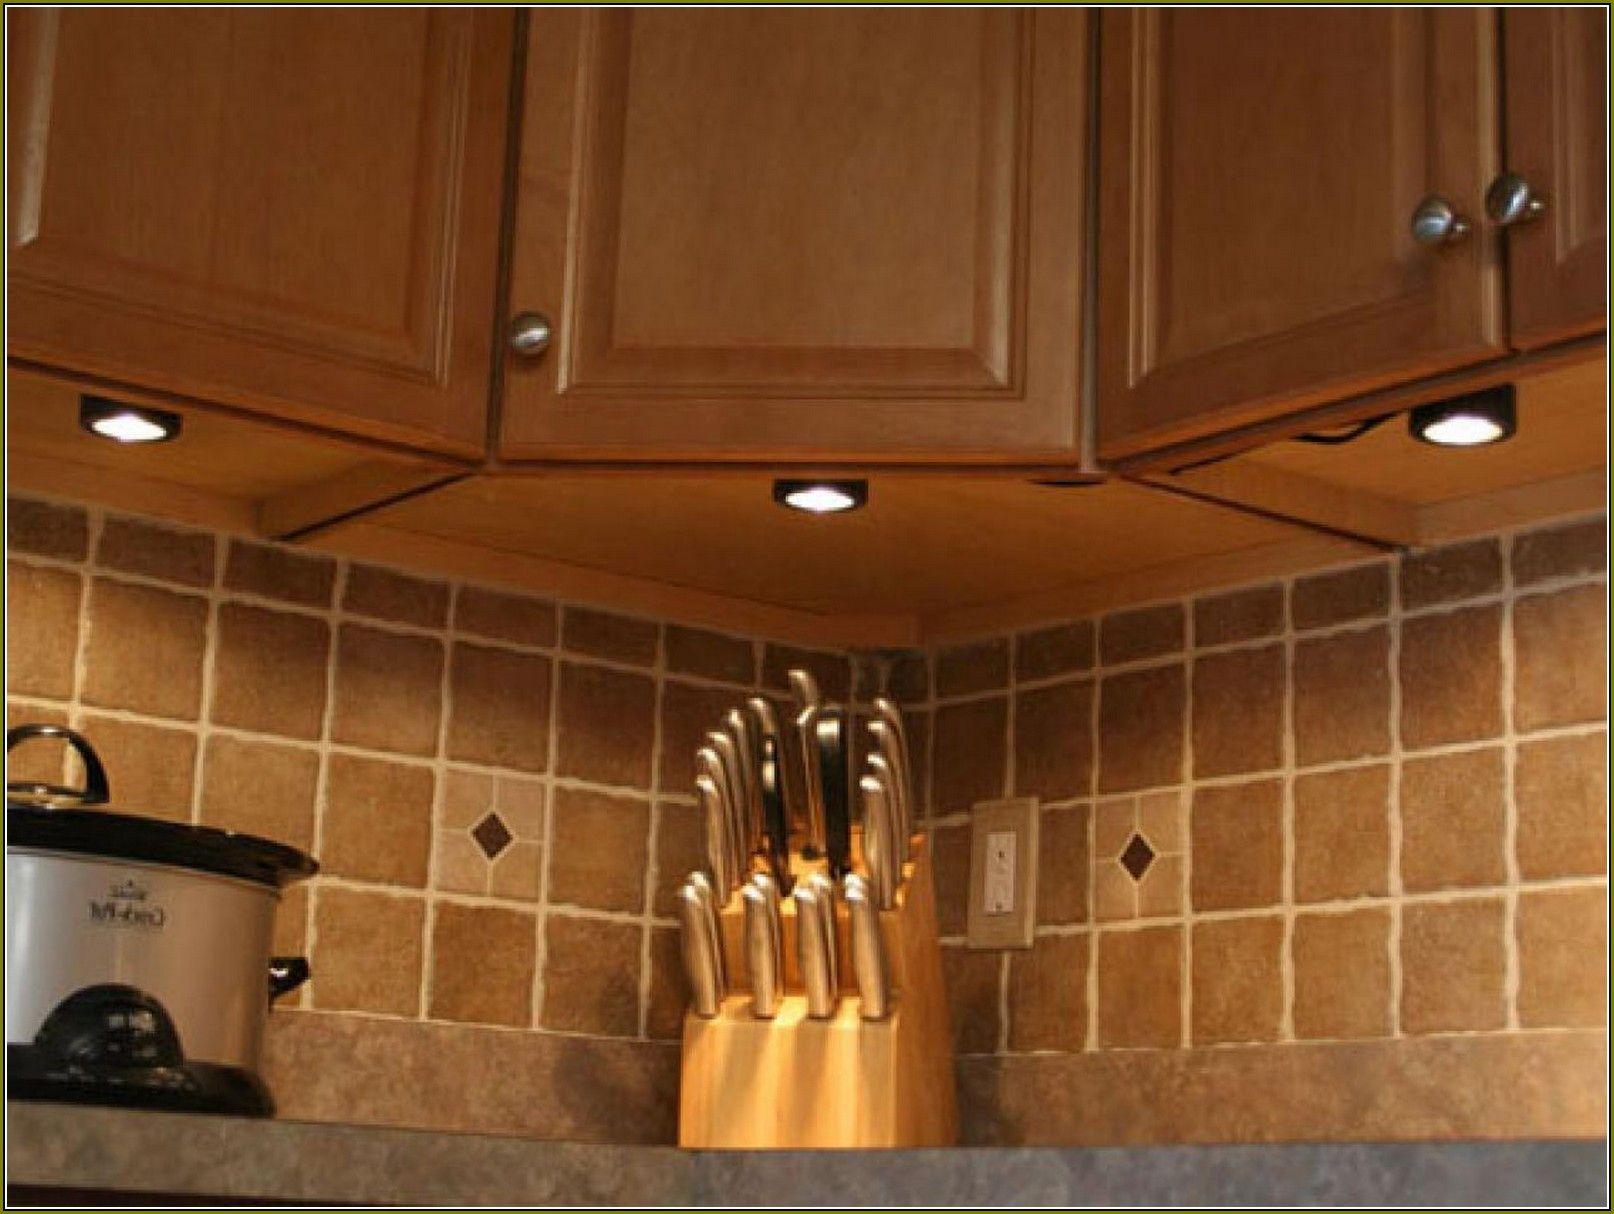 2018 battery puck lights under cabinet kitchen shelf display ideas 2018 battery puck lights under cabinet kitchen shelf display ideas check more at http aloadofball Choice Image